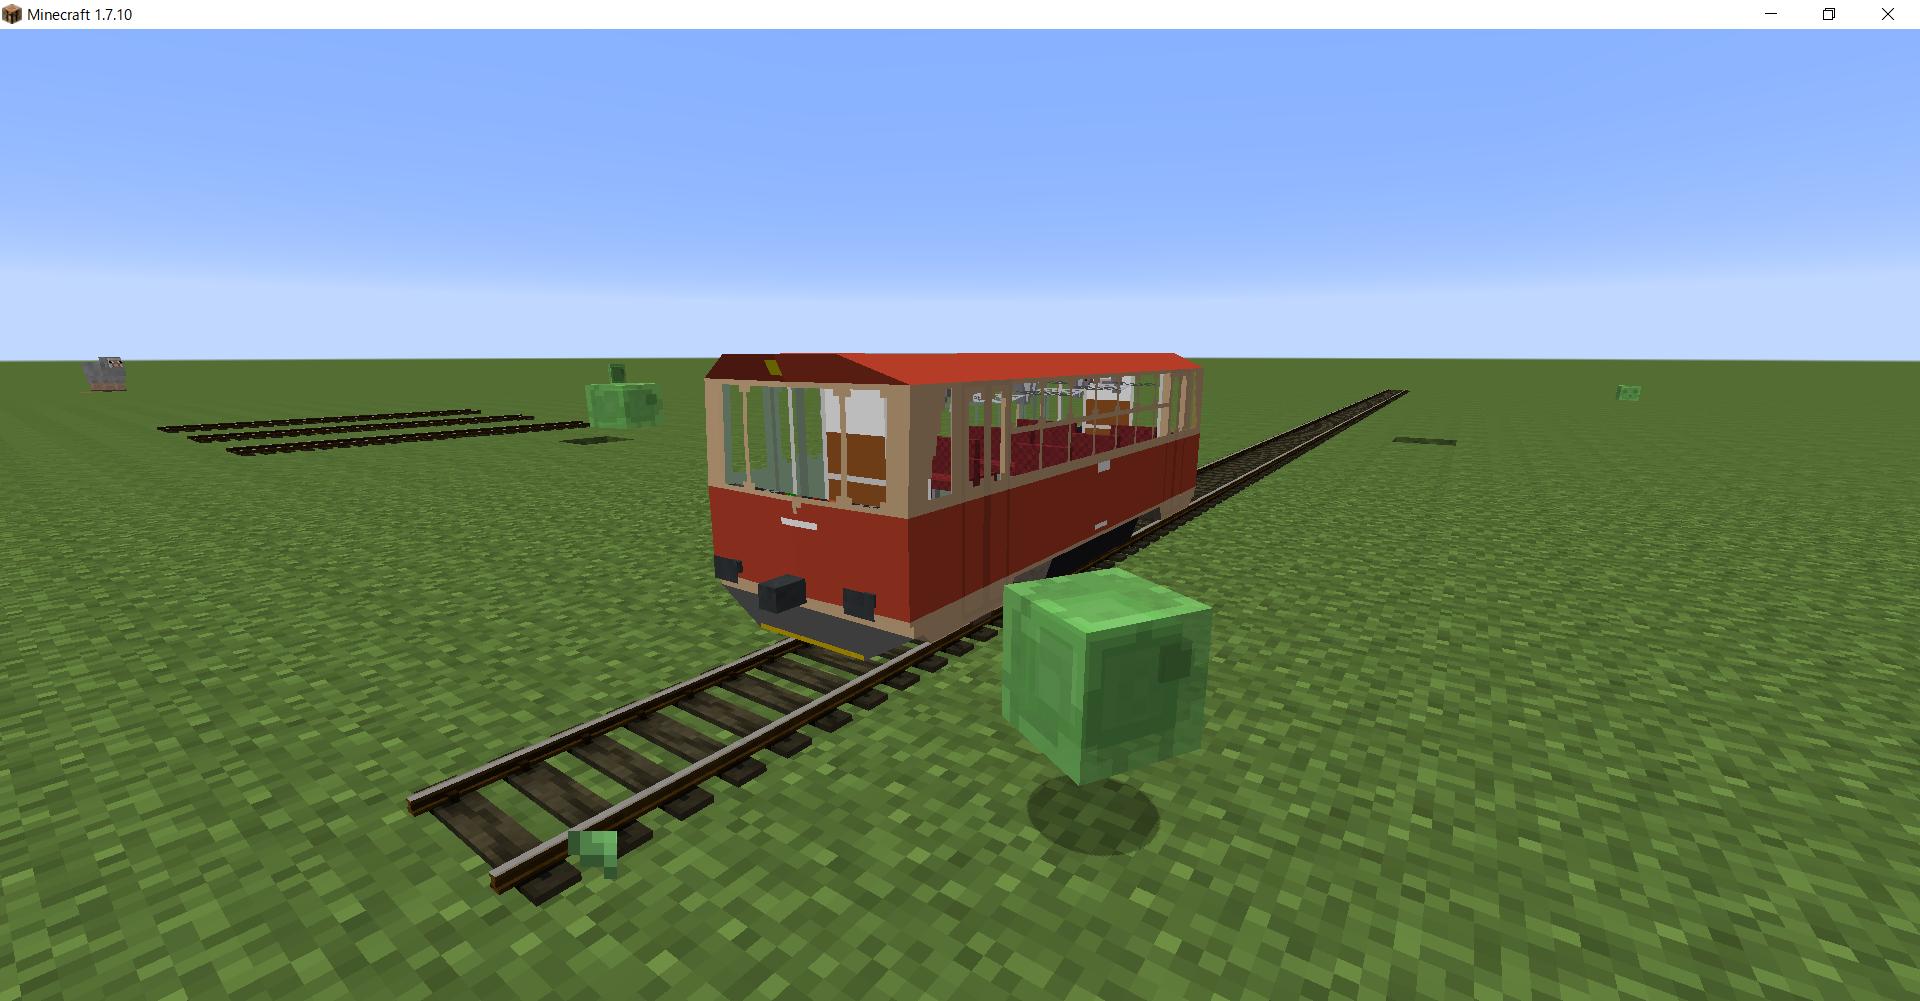 Minecraft 1.7.10 2021_08_29 12_04_56.png